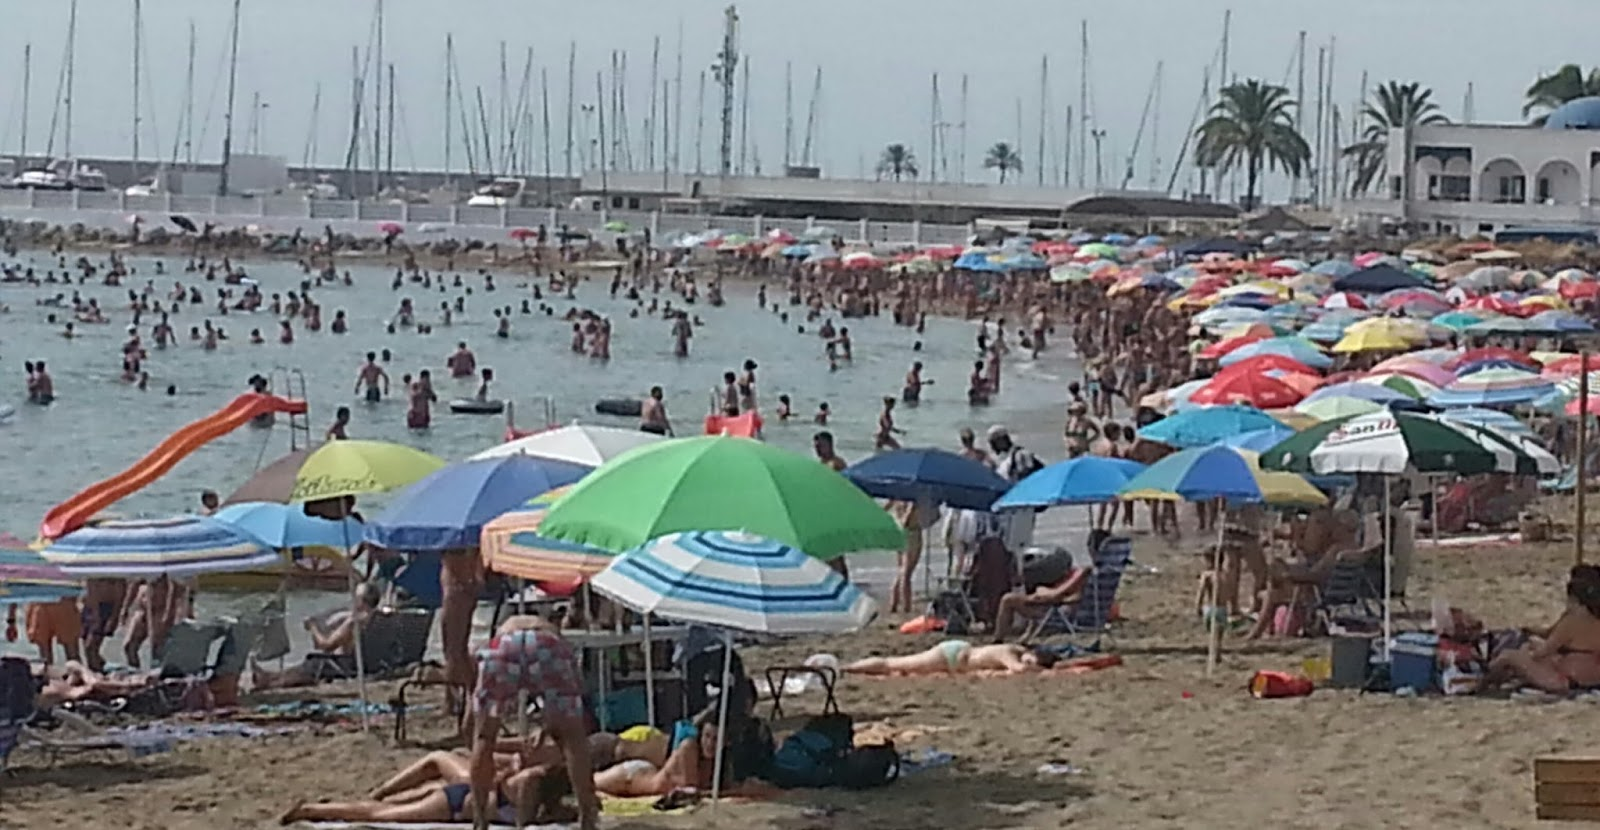 Asociaci n de mayores el tamujar silillos playa de for Piscina municipal torremolinos